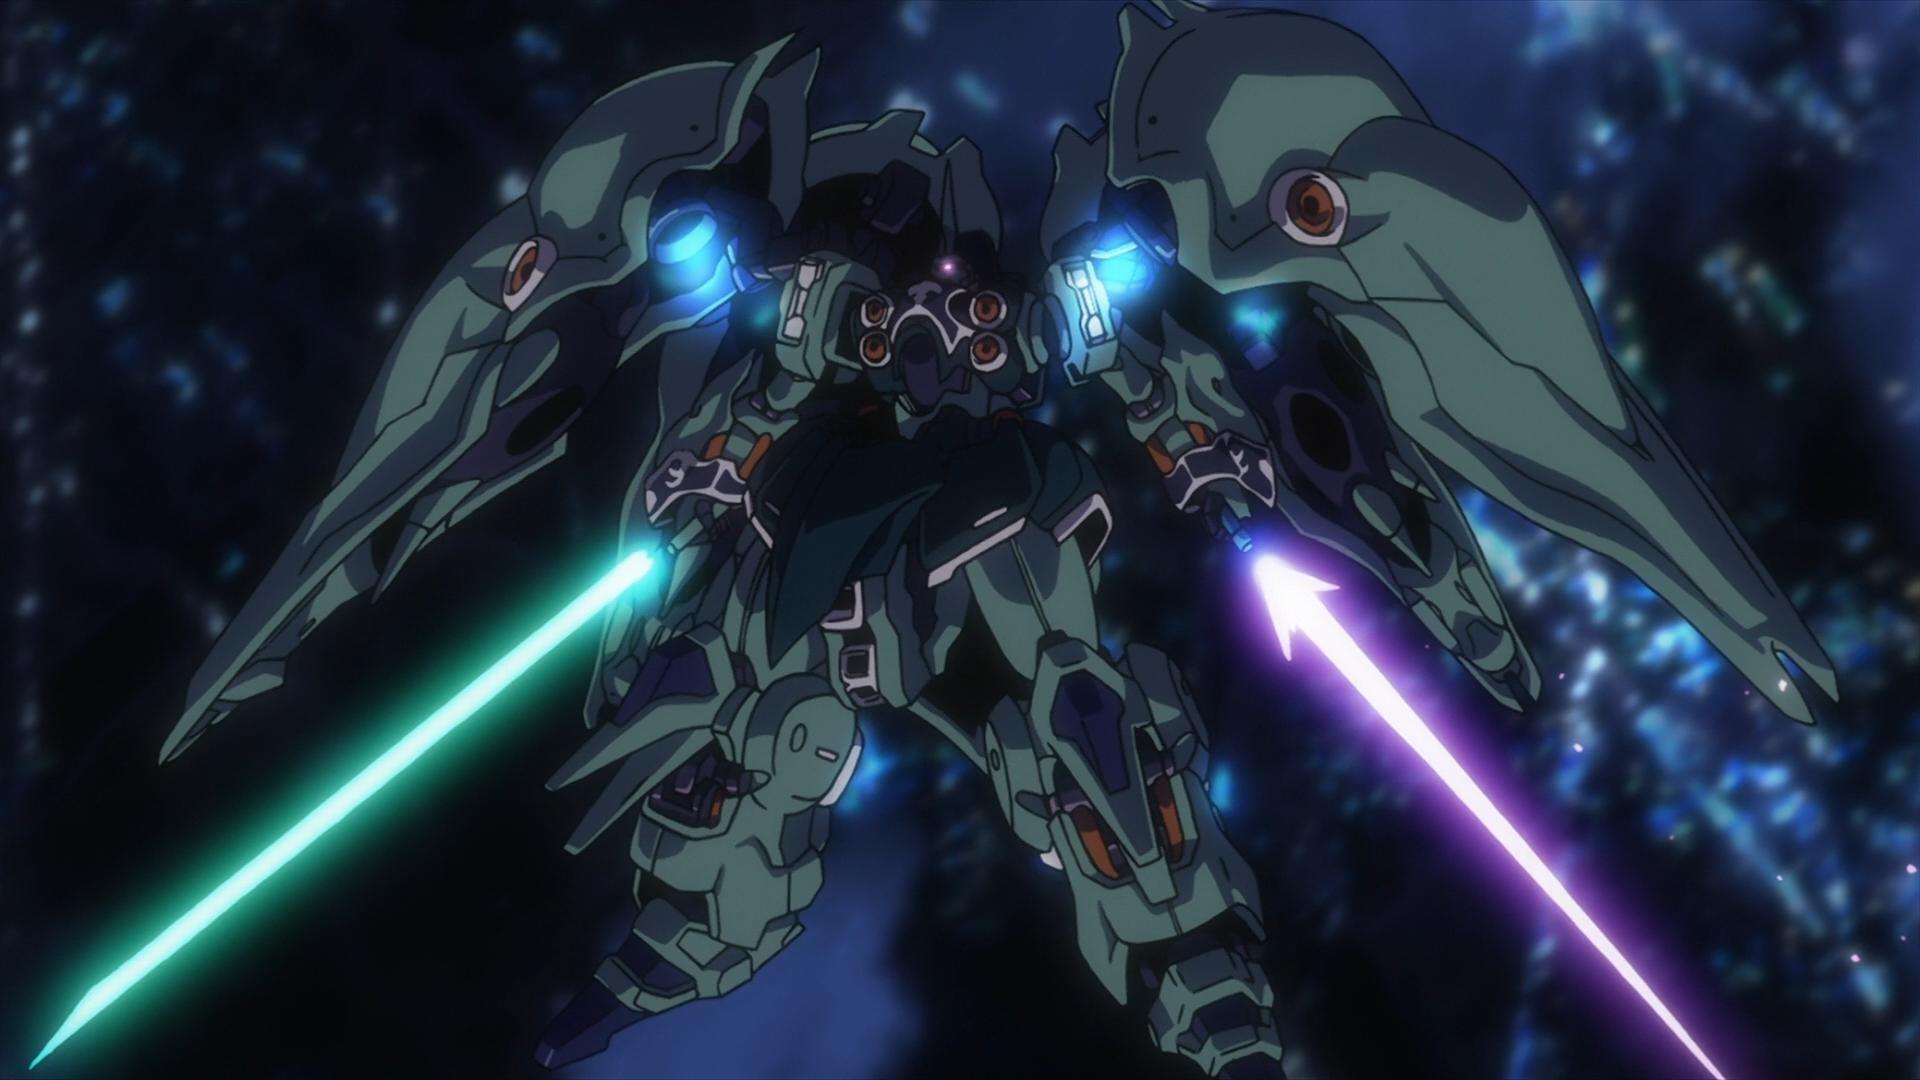 Gundam Unicorn Wallpapers 67 Pictures